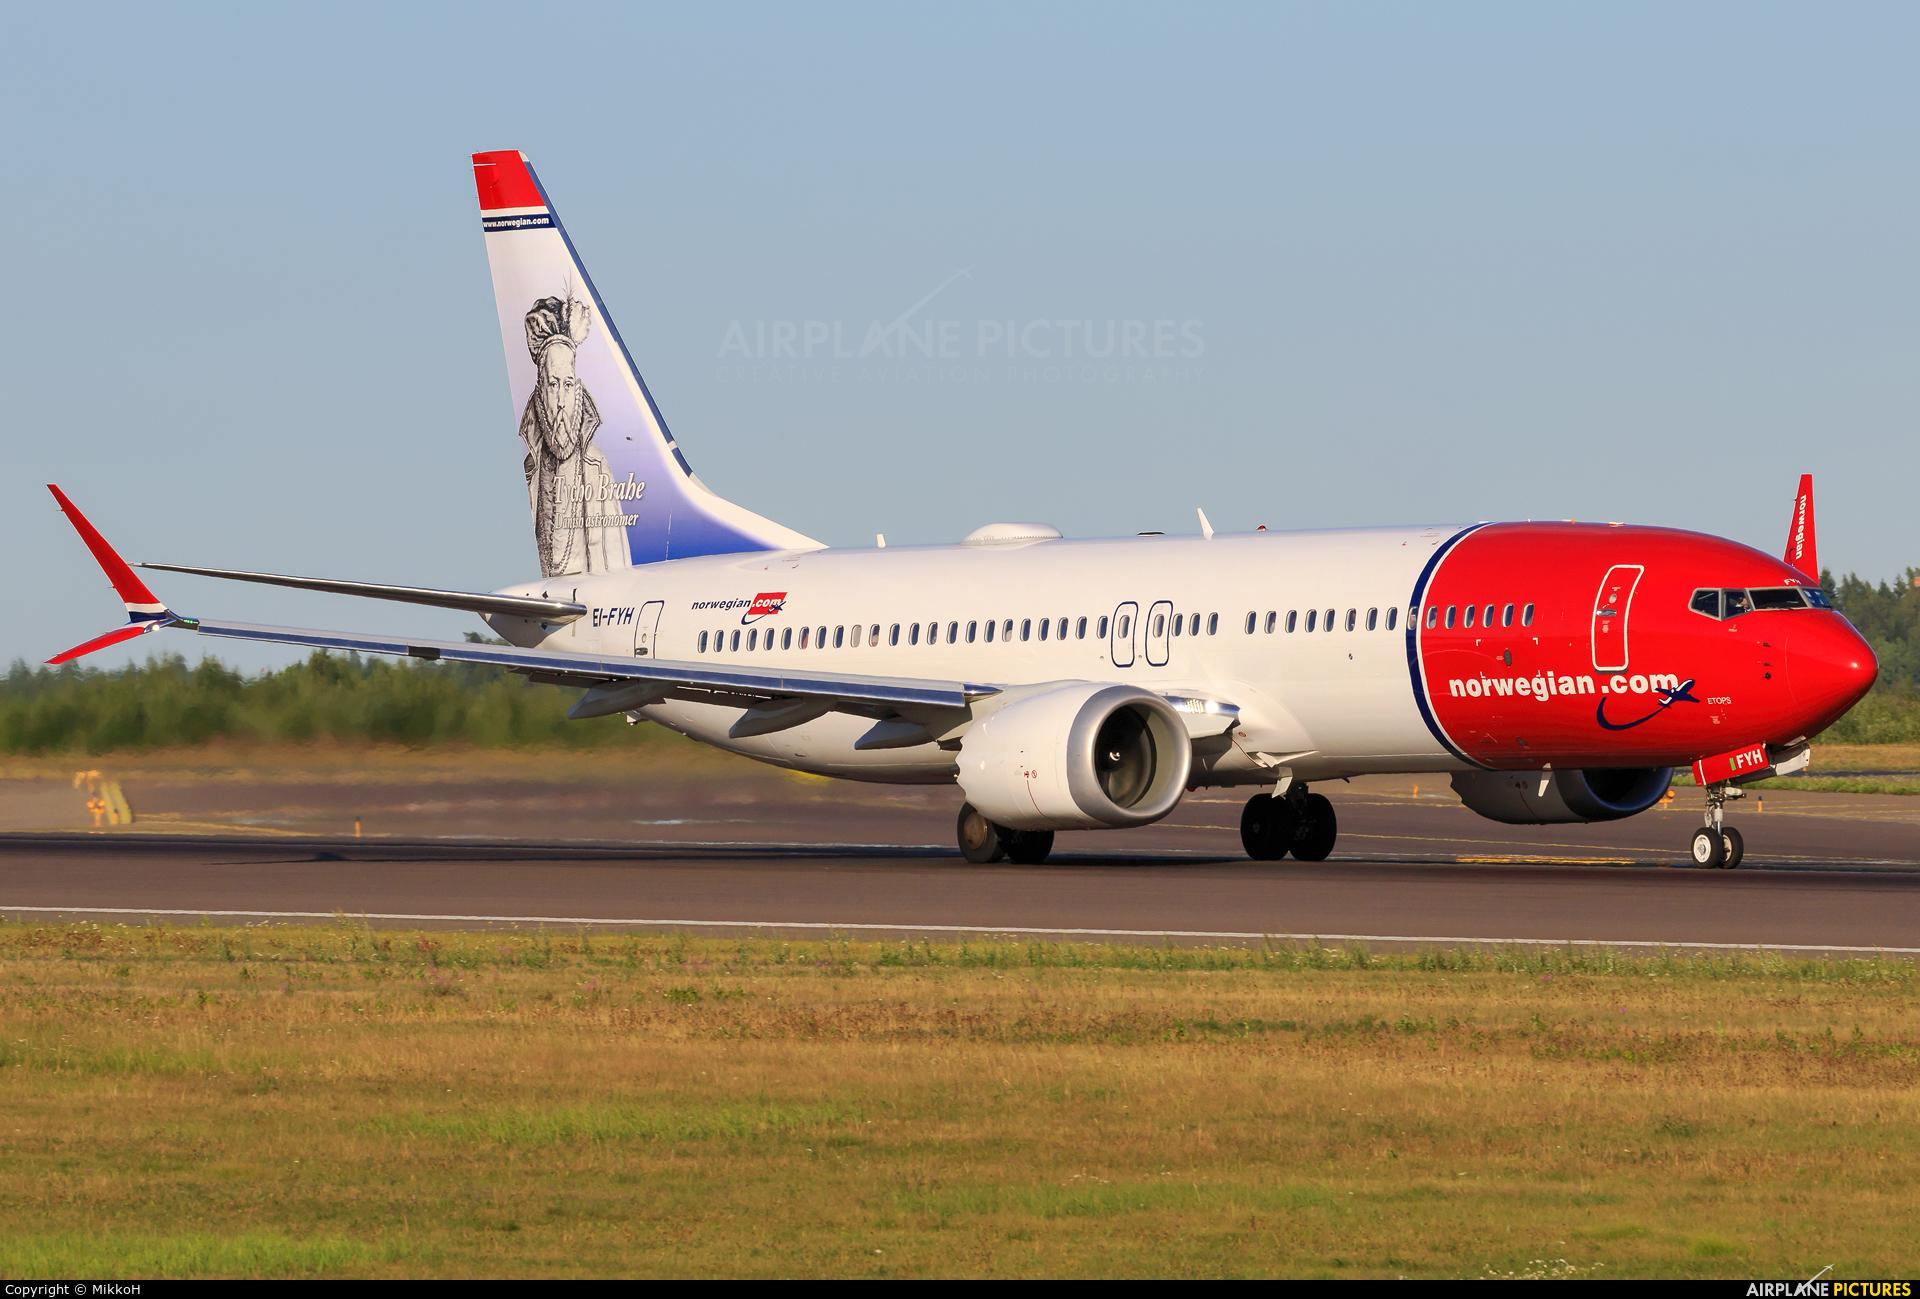 Norwegian Air Shuttle EI-FYH aircraft at Helsinki - Vantaa